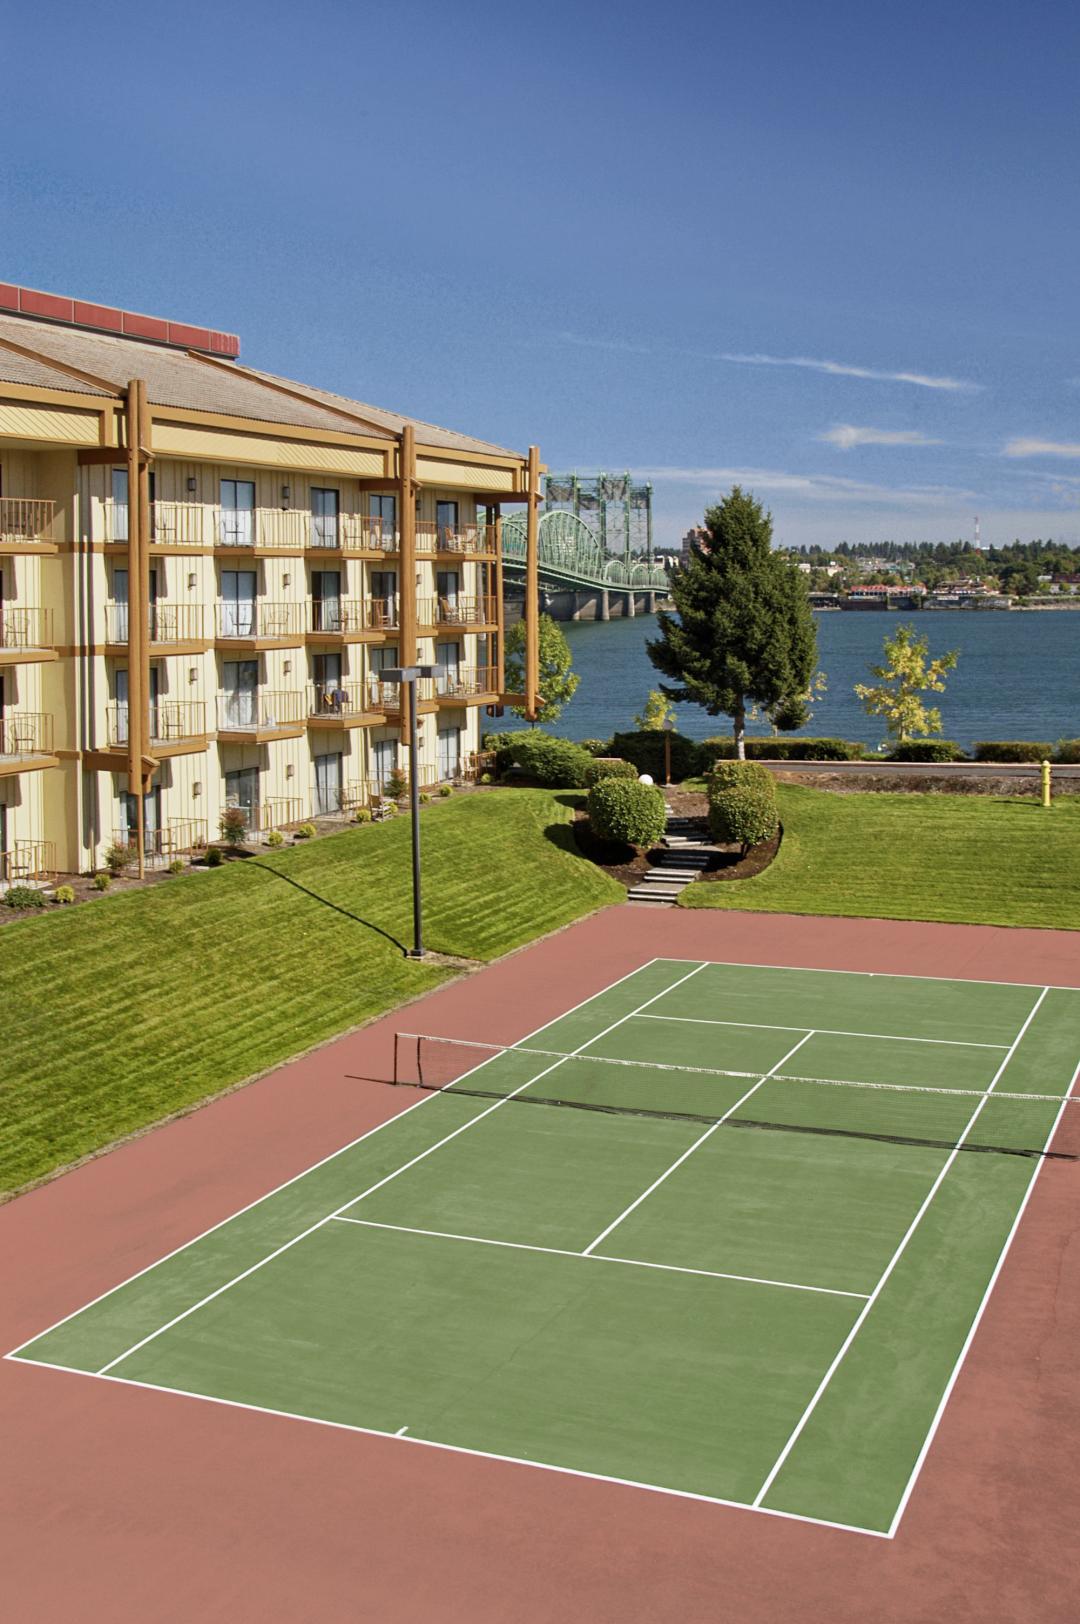 Tennis court at Red Lion on the River Jantzen Beach